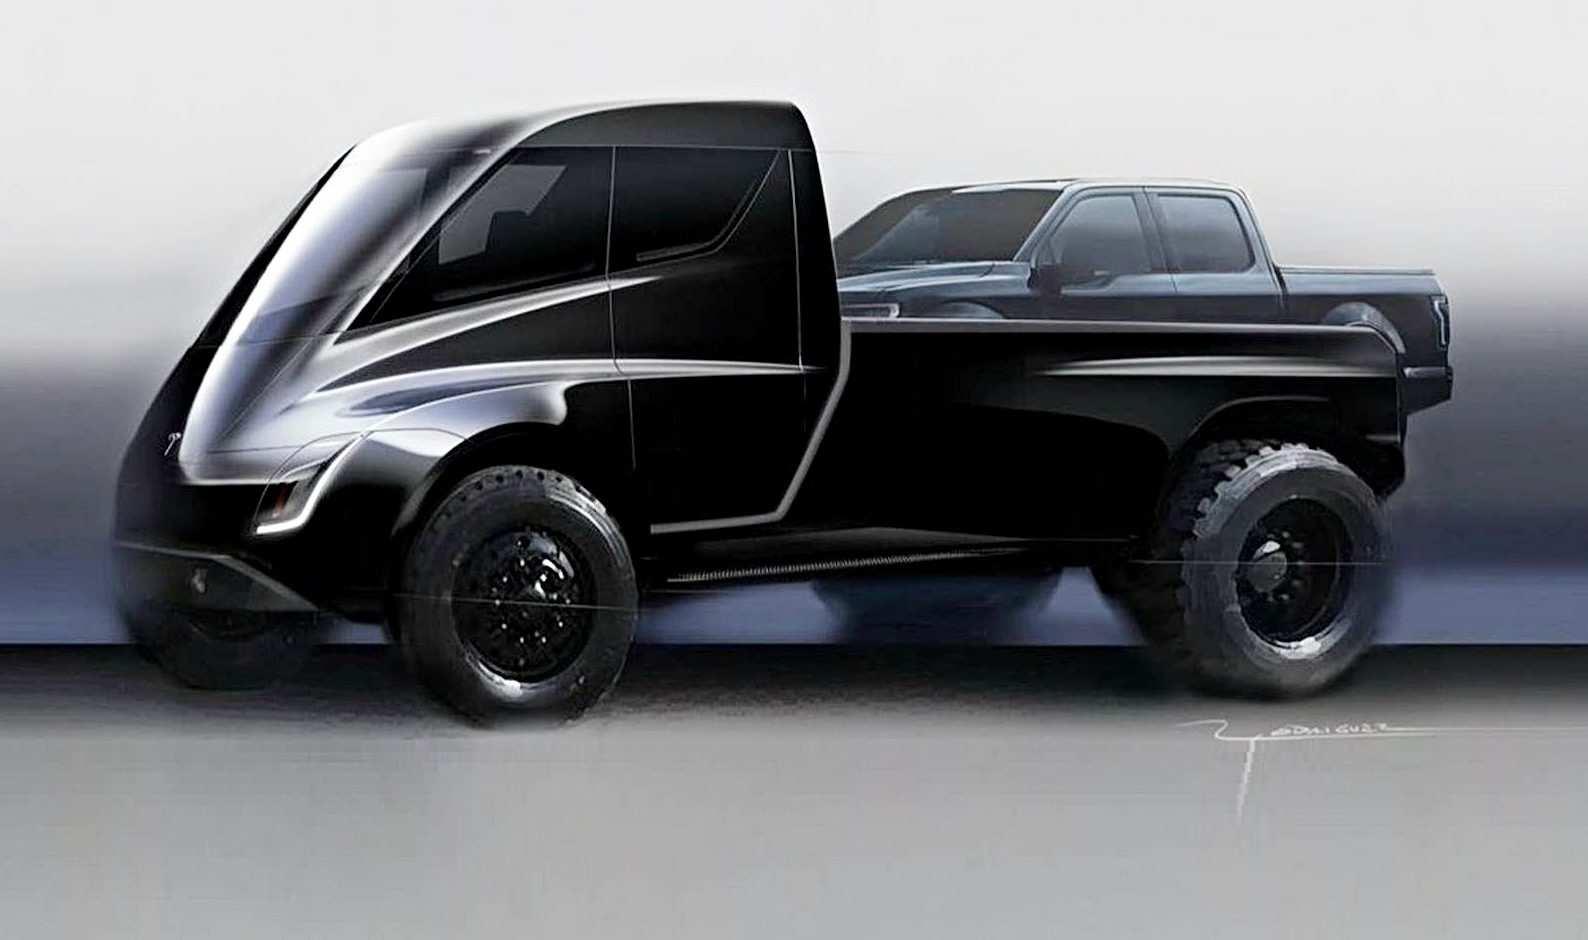 31 New 2020 Tesla Truck Release Date with 2020 Tesla Truck